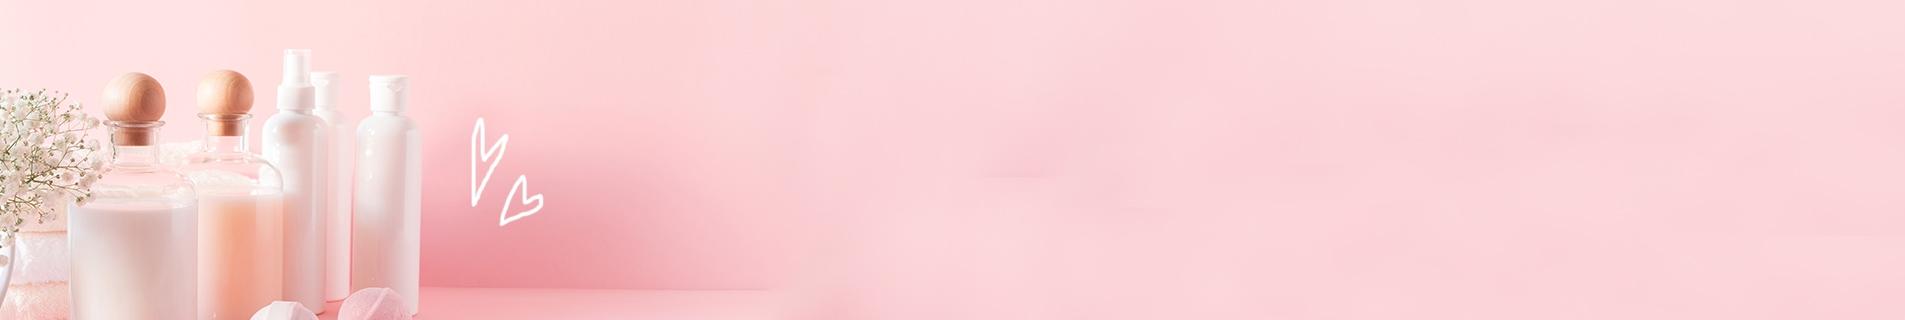 Promo moins de 5€   Site de maquillage pas cher   SAGA Cosmetics